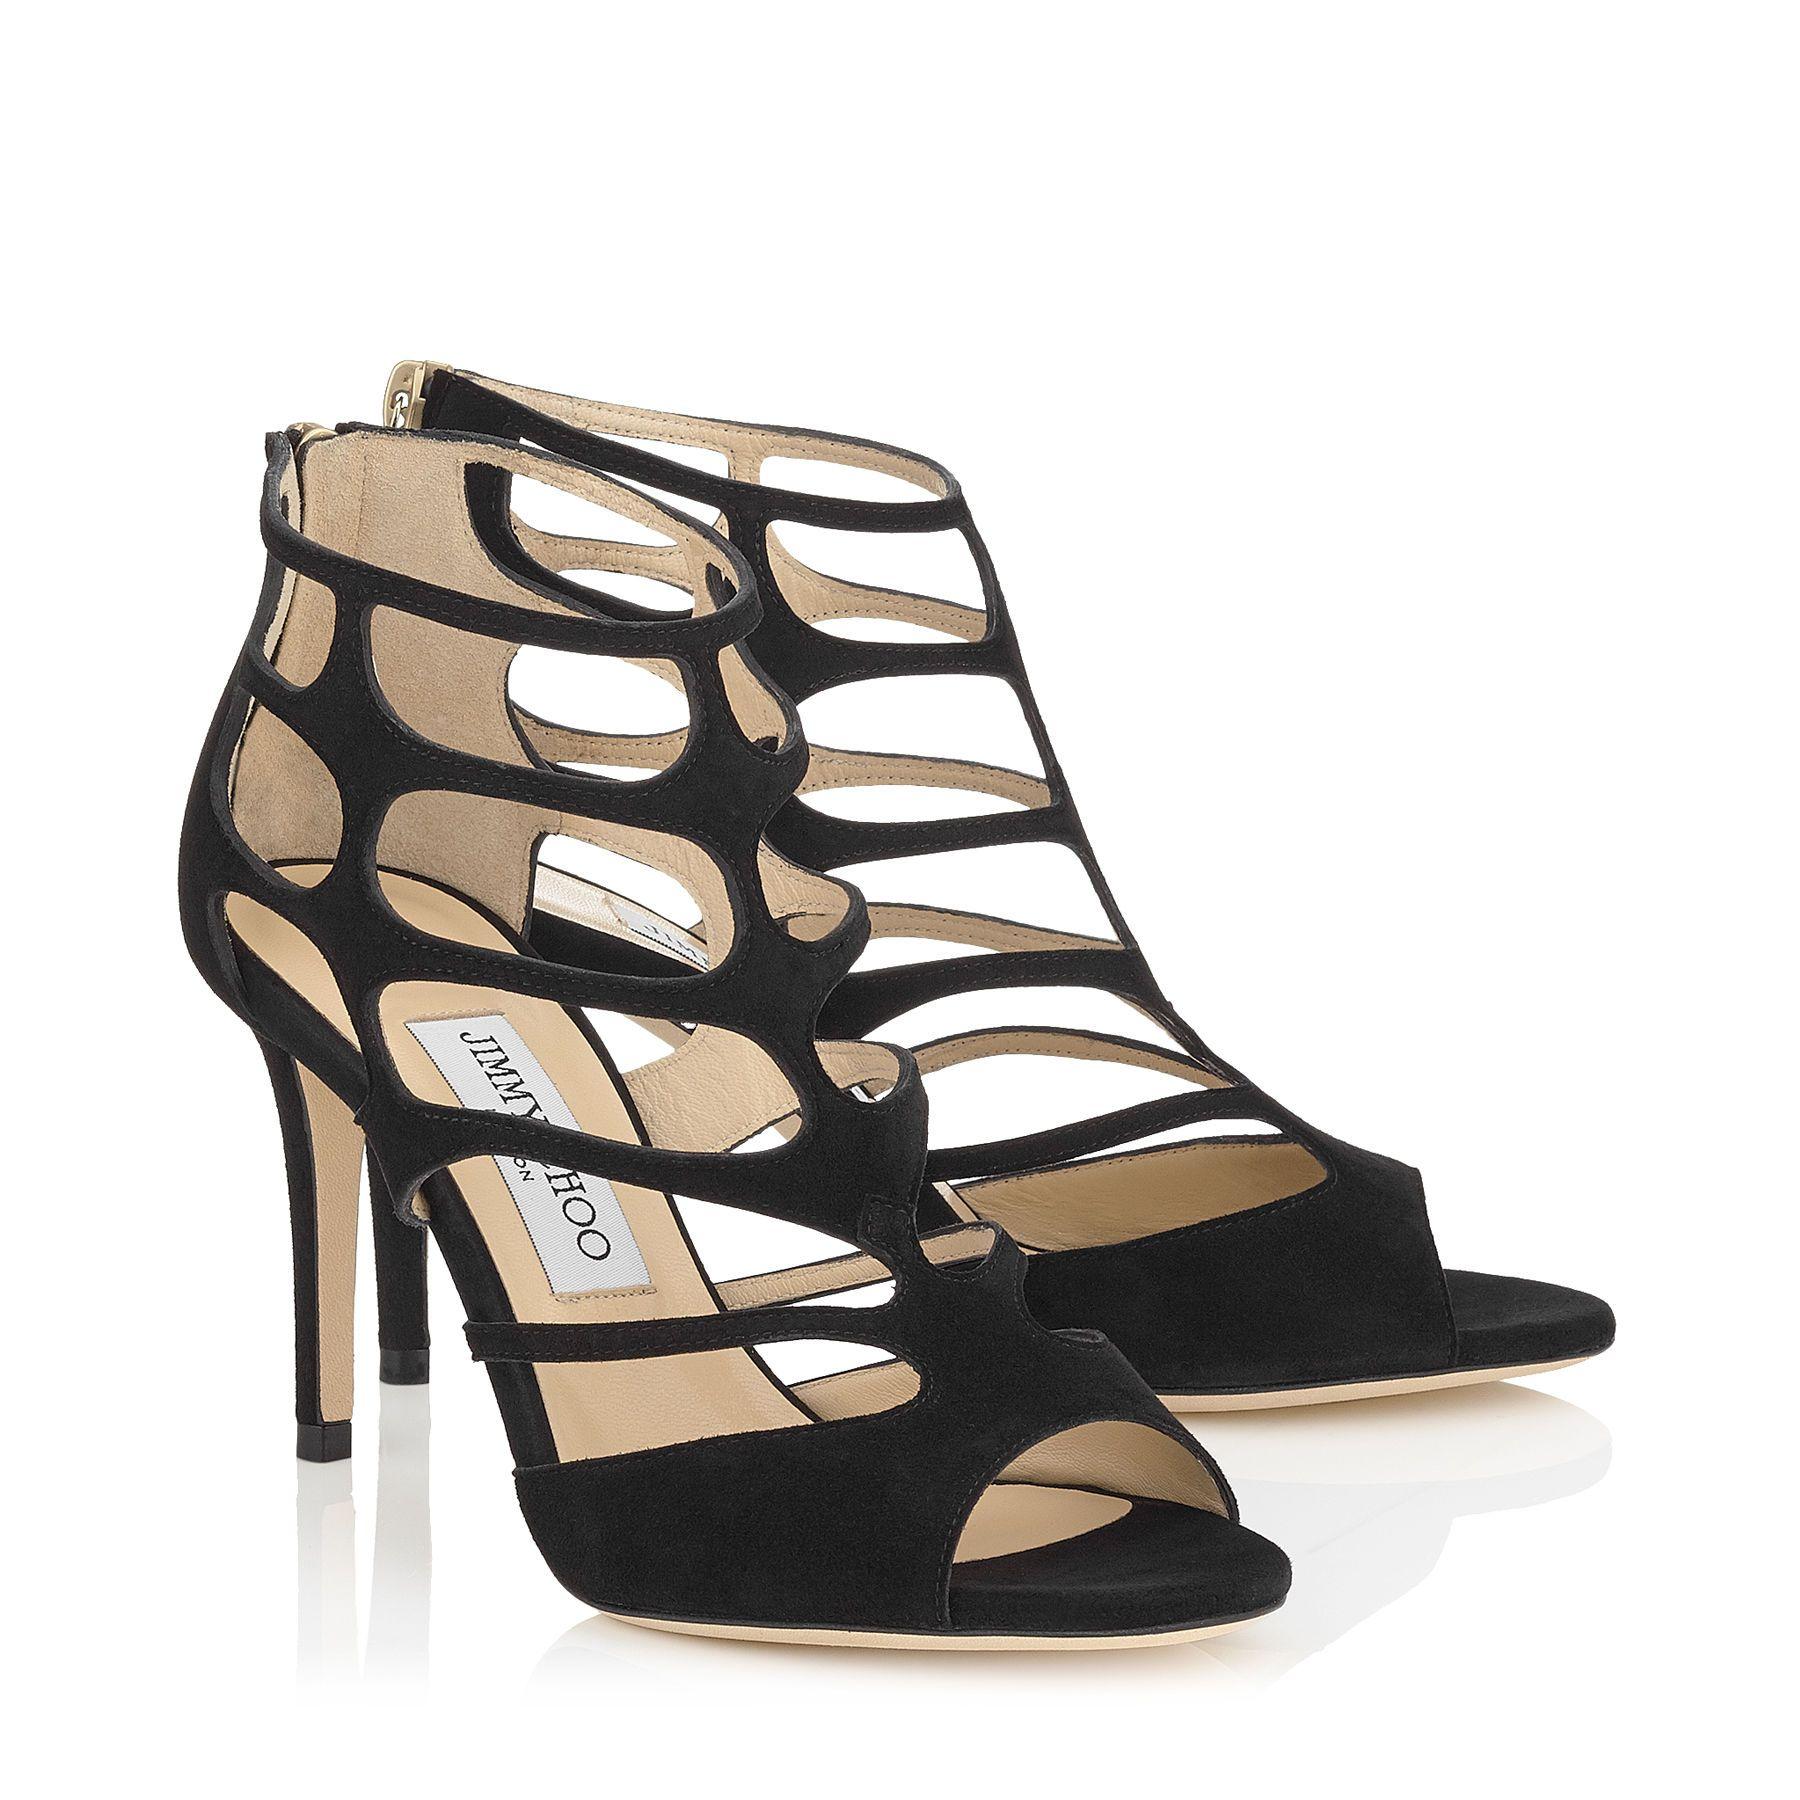 REN 85 | Jimmy choo shoes, Jimmy choo